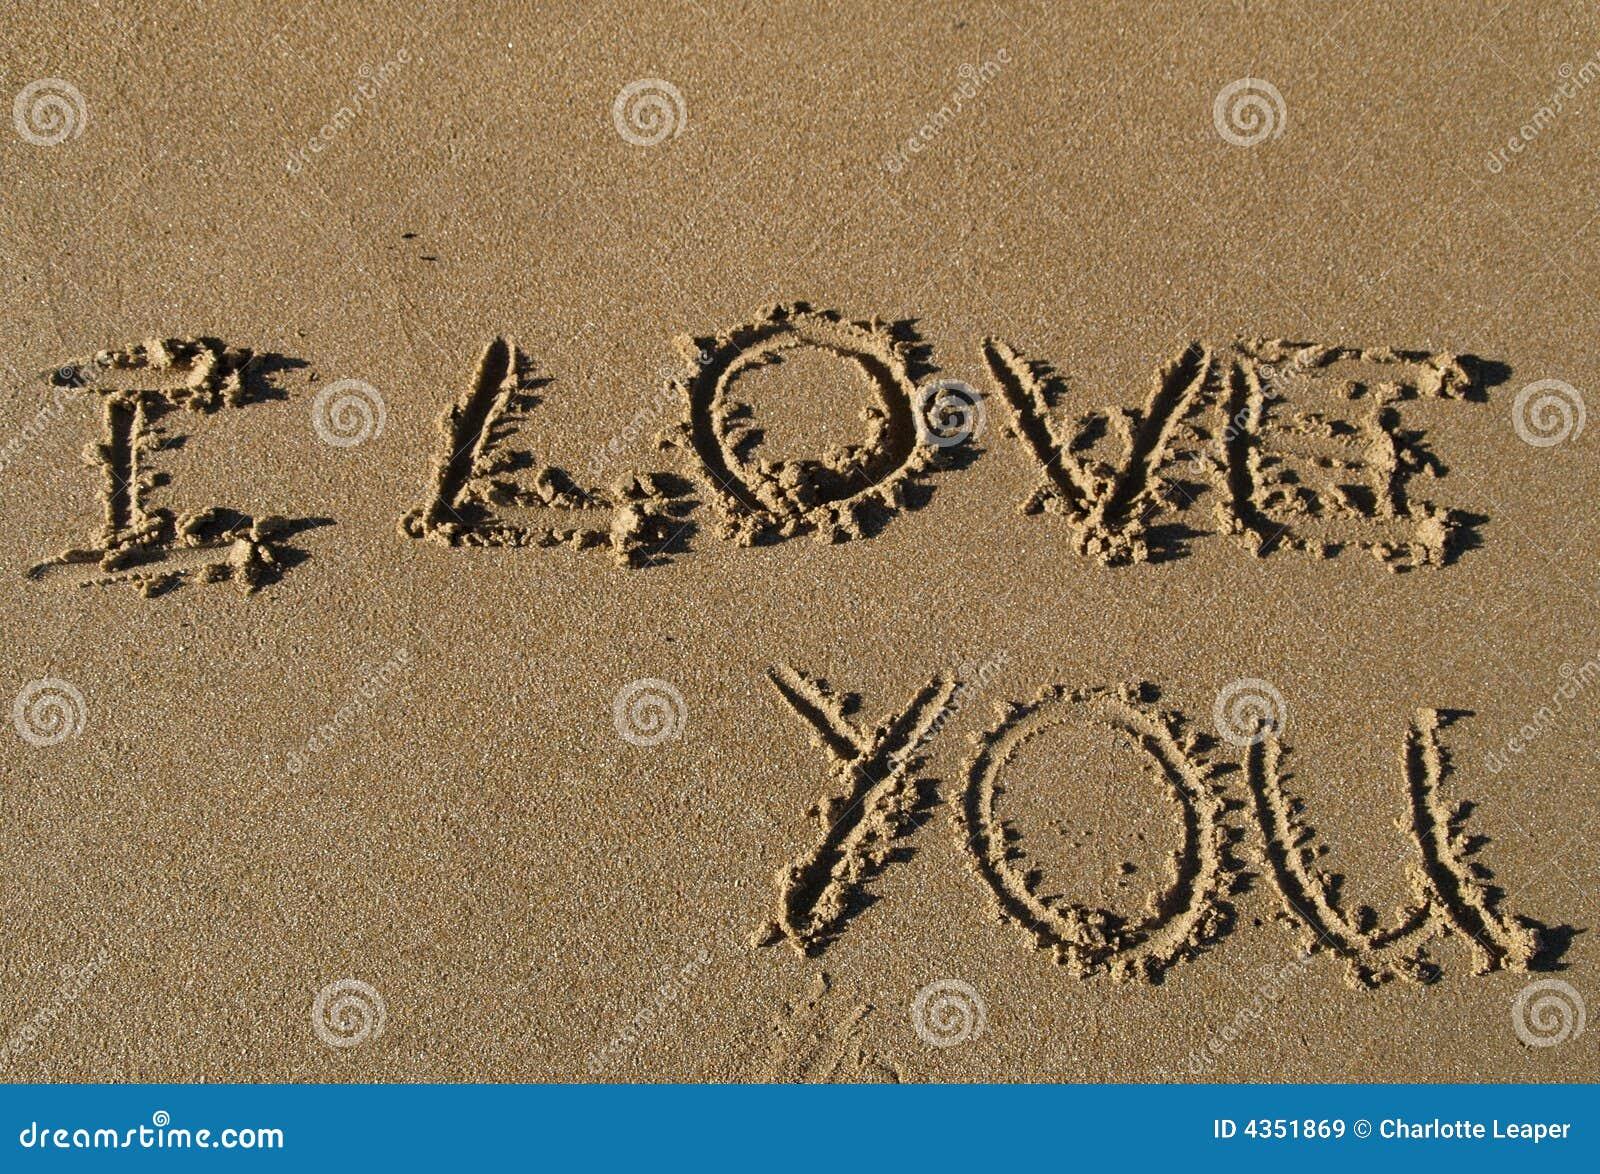 Eu Te Amo Escrito Na Areia Imagens De Stock Royalty Free